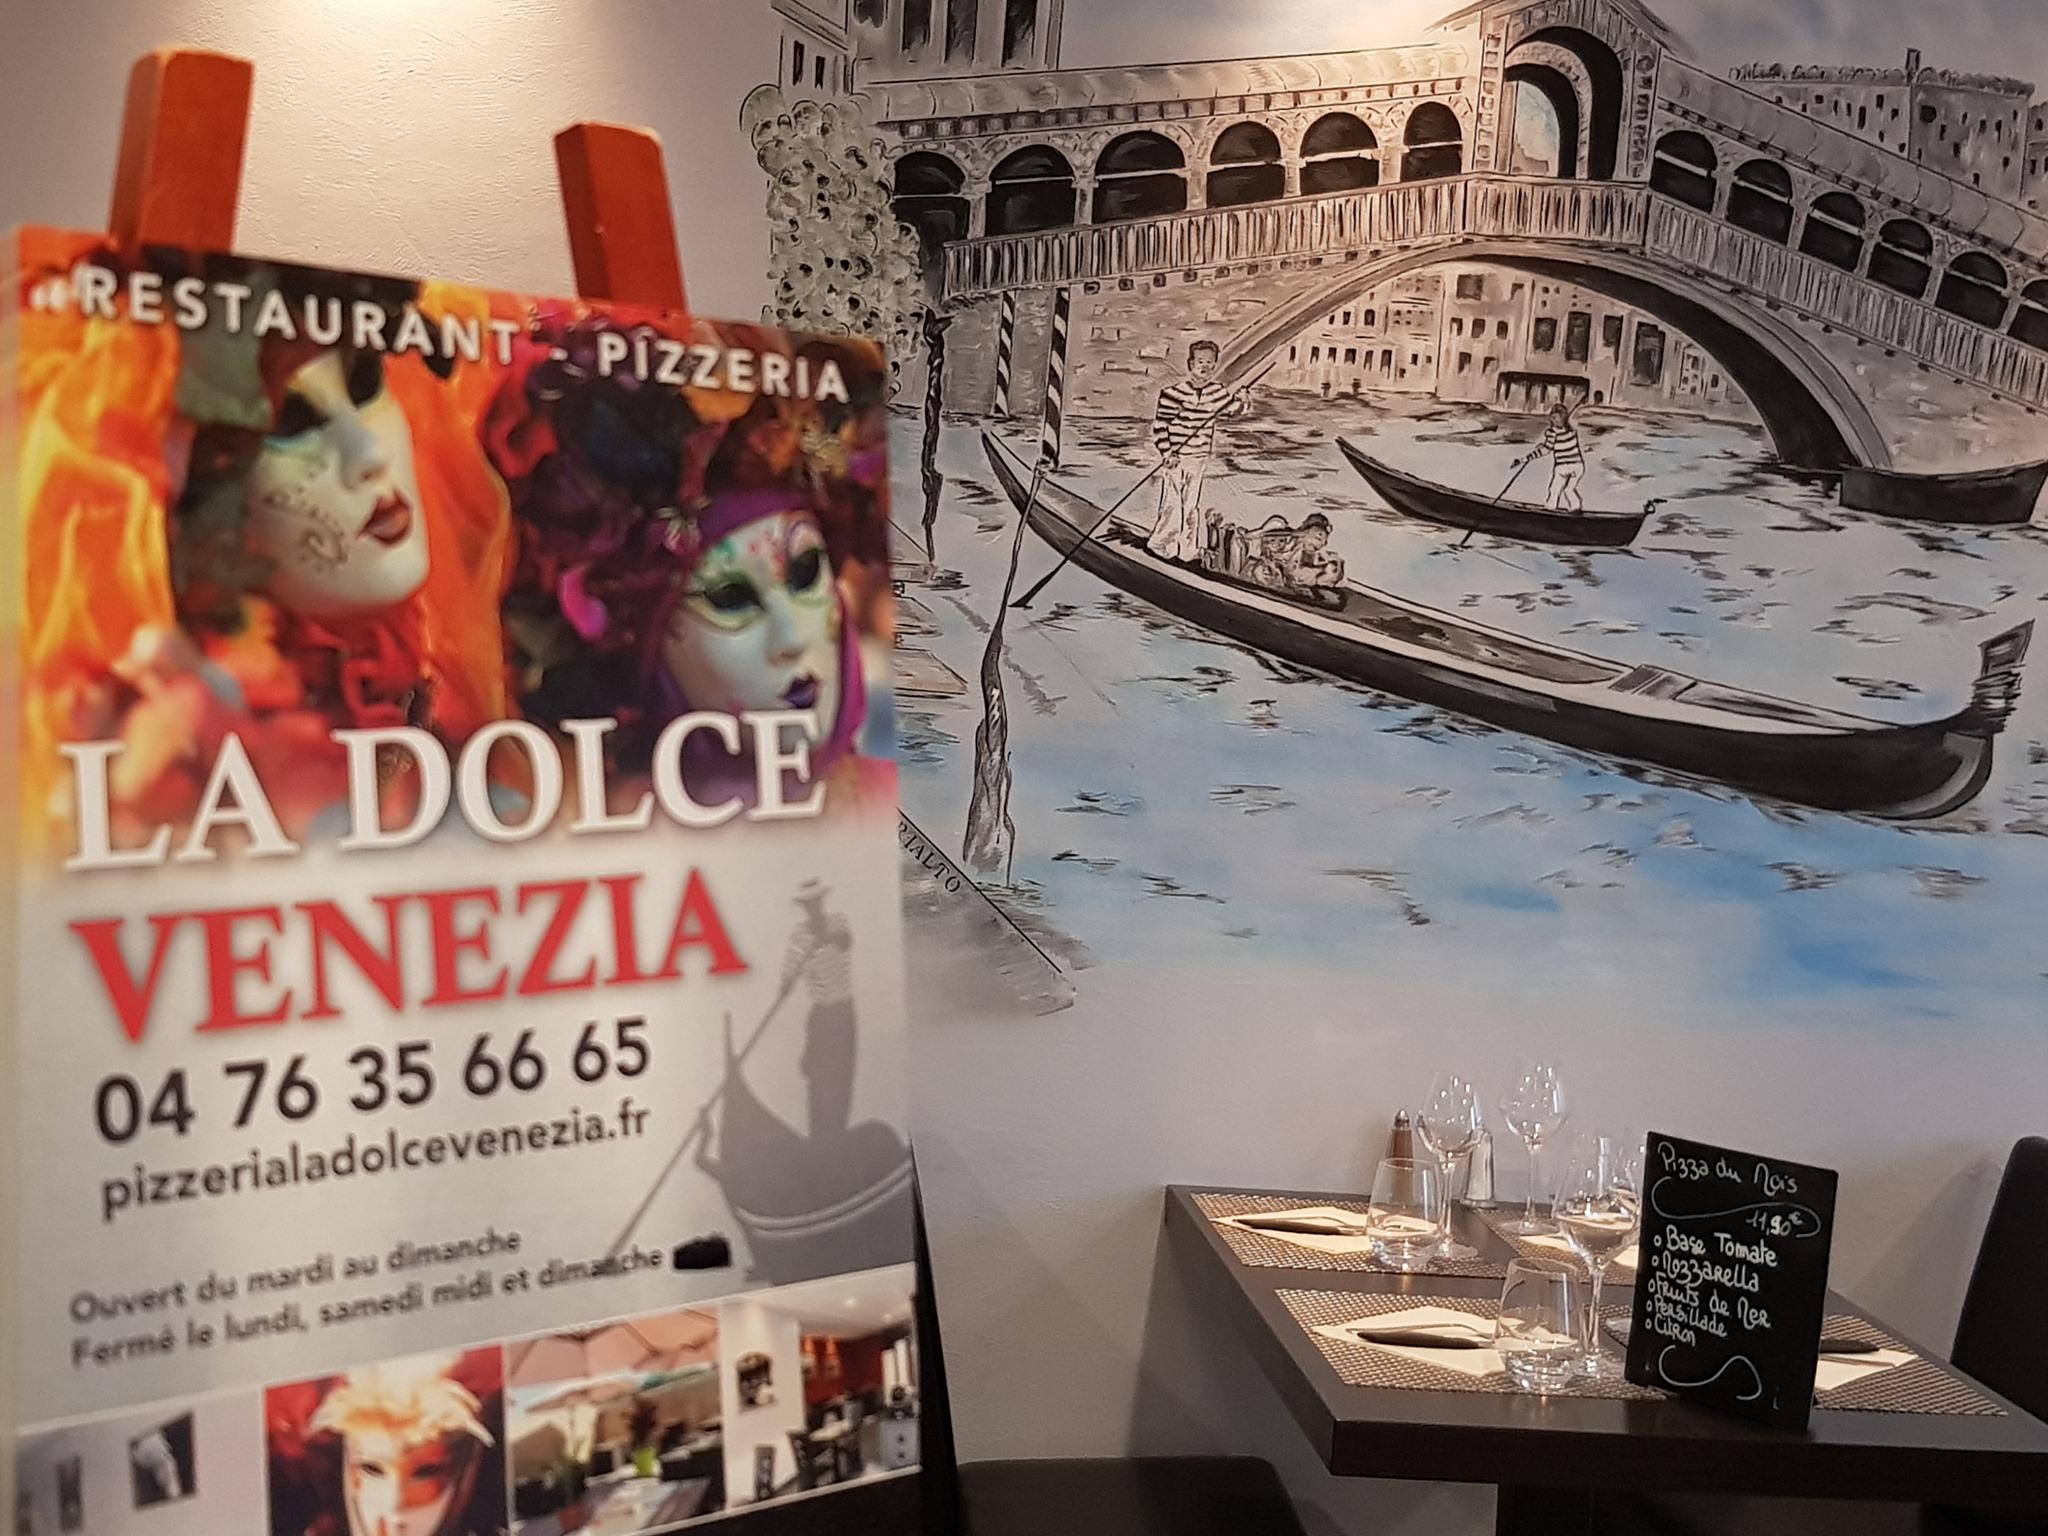 Pizzeria Dolce Venezia